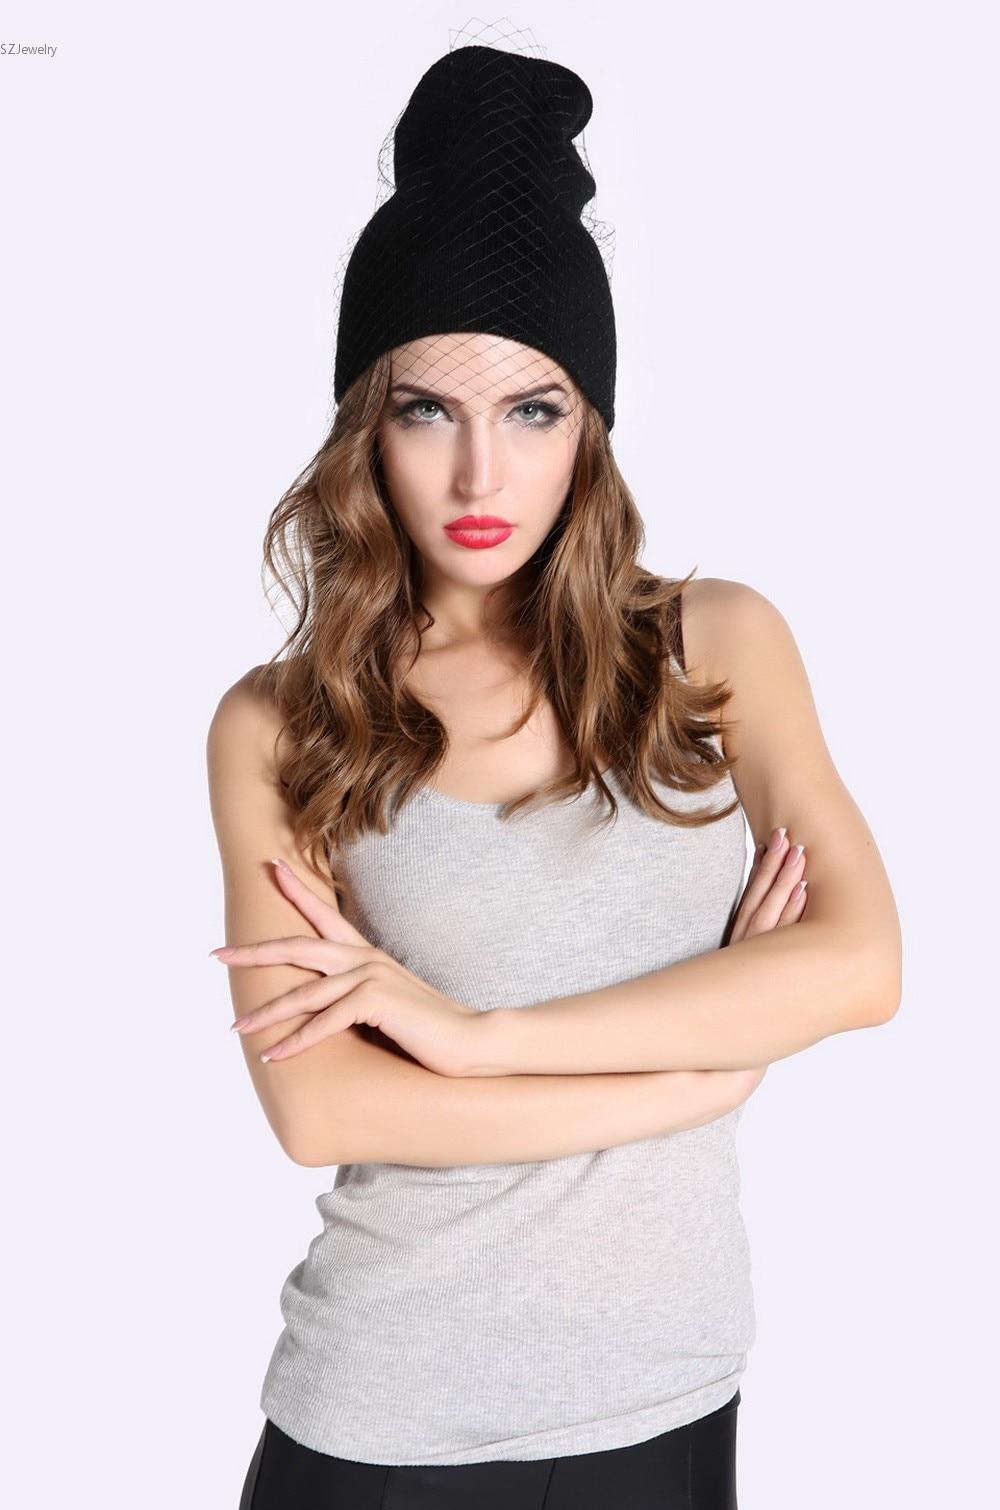 Newest UK style Veil Hats Womens Beanie Hat Touca Feminina Supermodel Street Snap Net Caps Winter Knitted